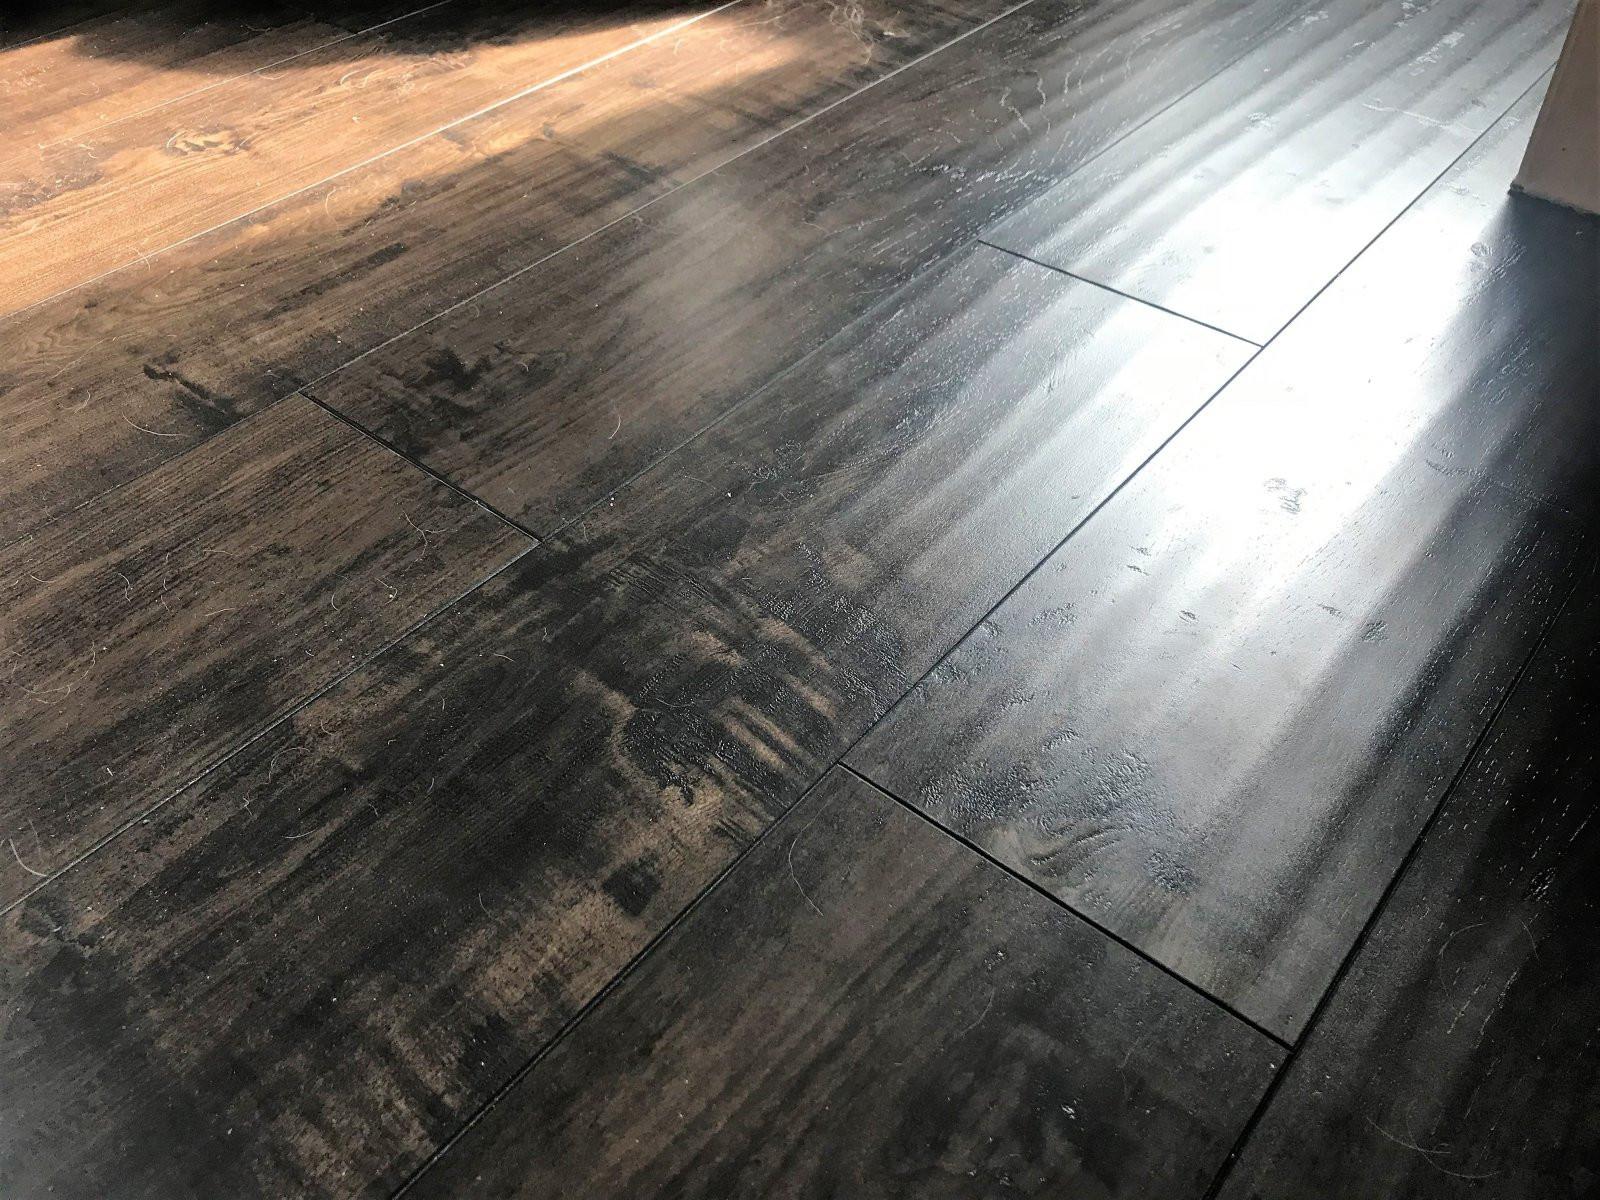 Hardwood Flooring Burlington Ontario Of Burlington Detached Bliss Realty Investors with 22 New Laminate Dog Hairs Not Scratches